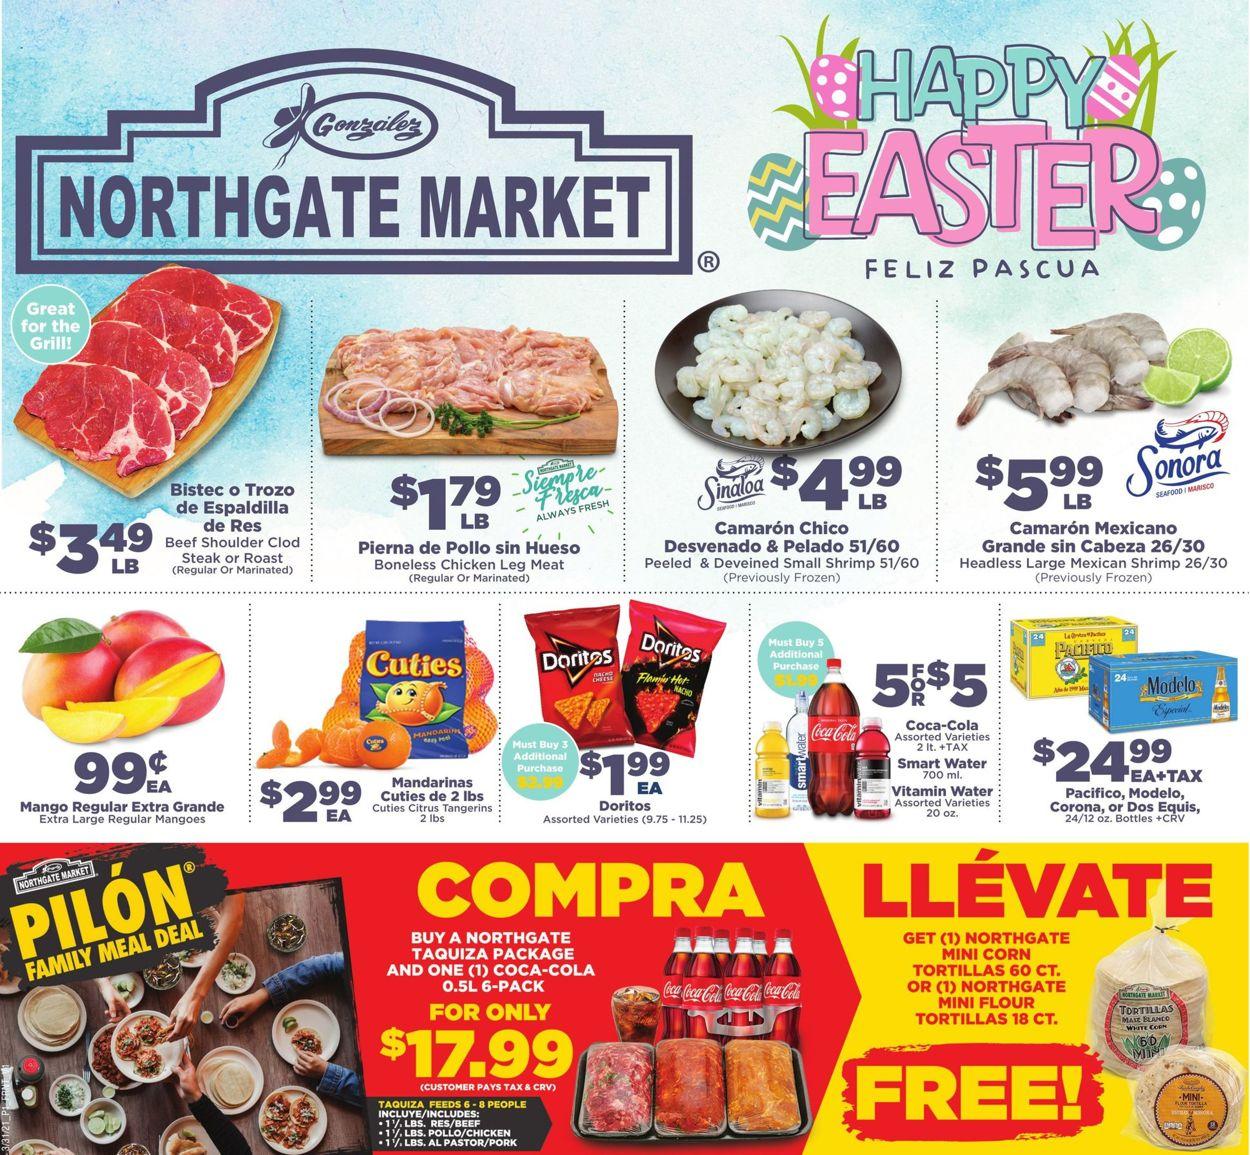 Northgate Market Easter 2021 Weekly Ad Circular - valid 03/31-04/06/2021